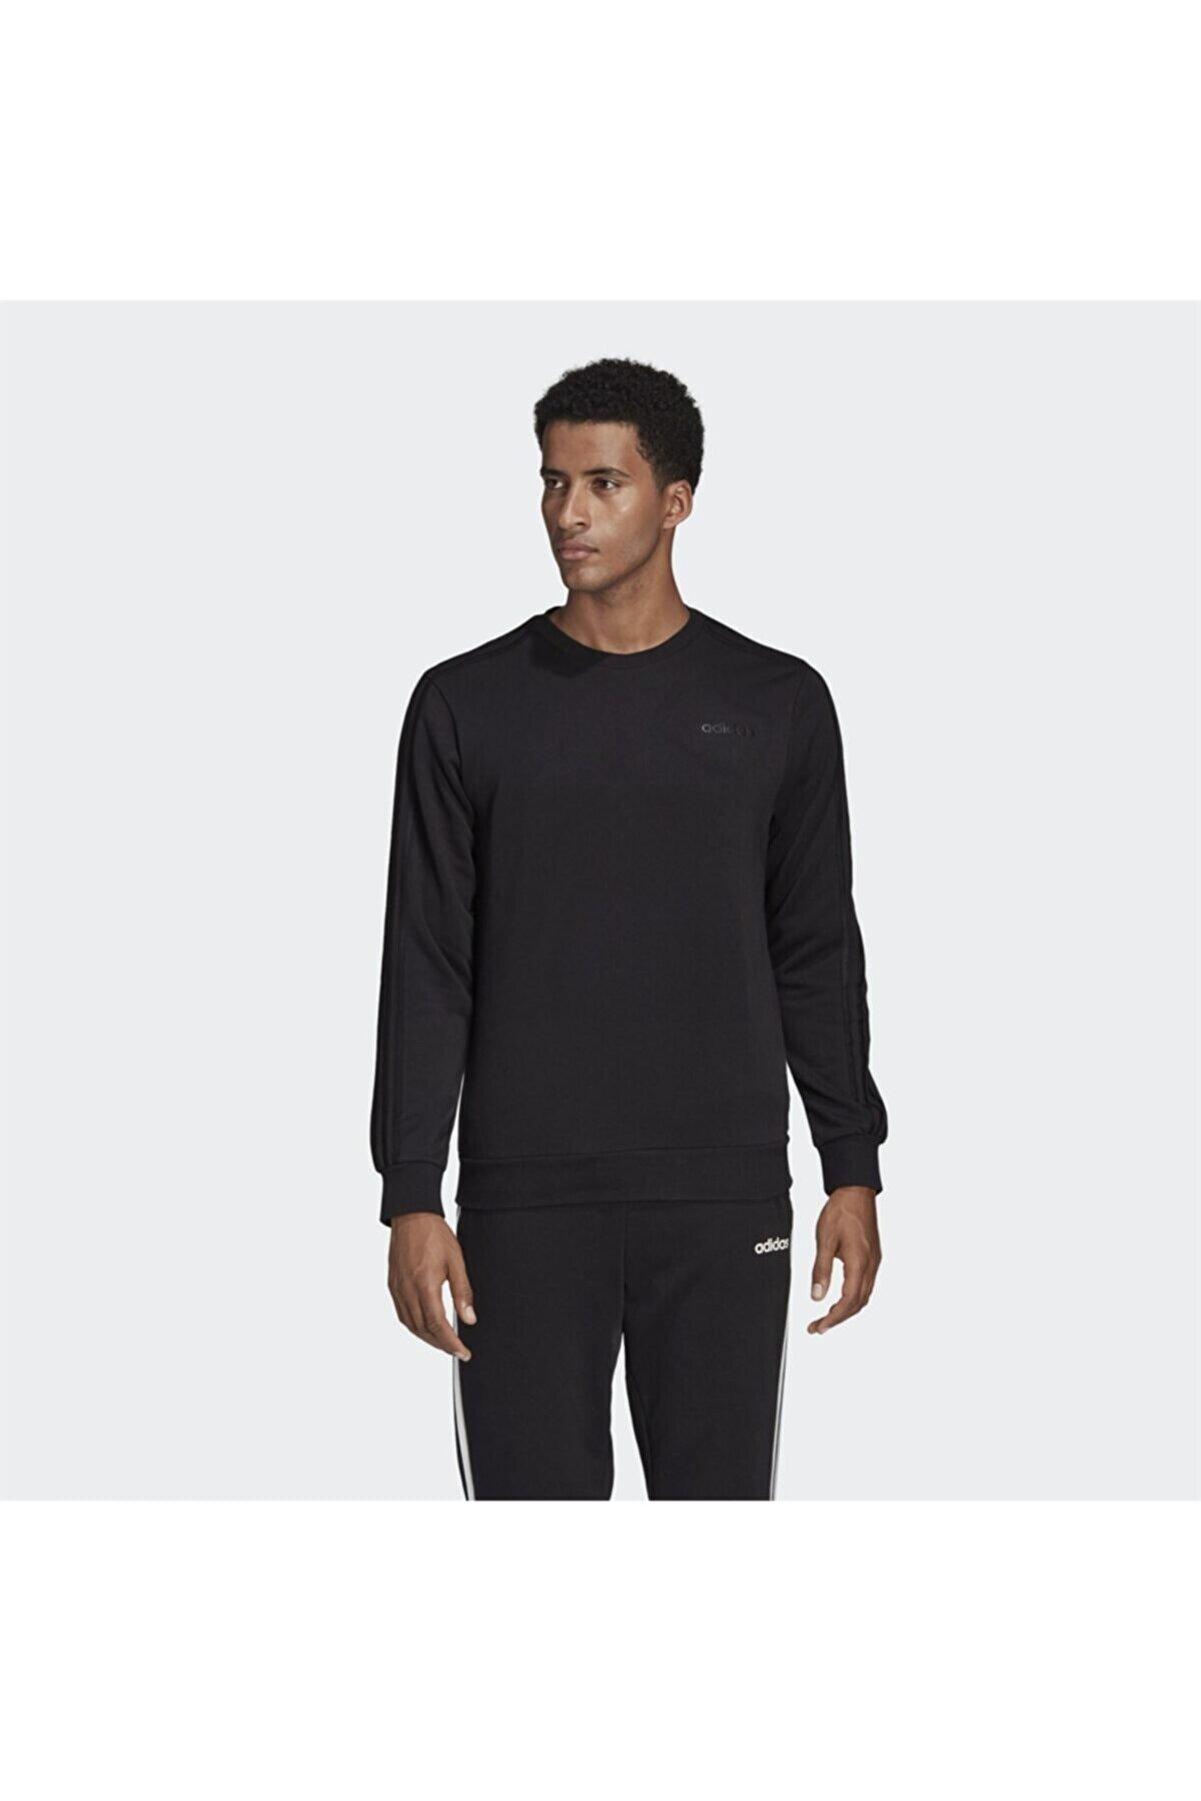 adidas E 3S CREW FT Siyah Erkek Sweatshirt 100664217